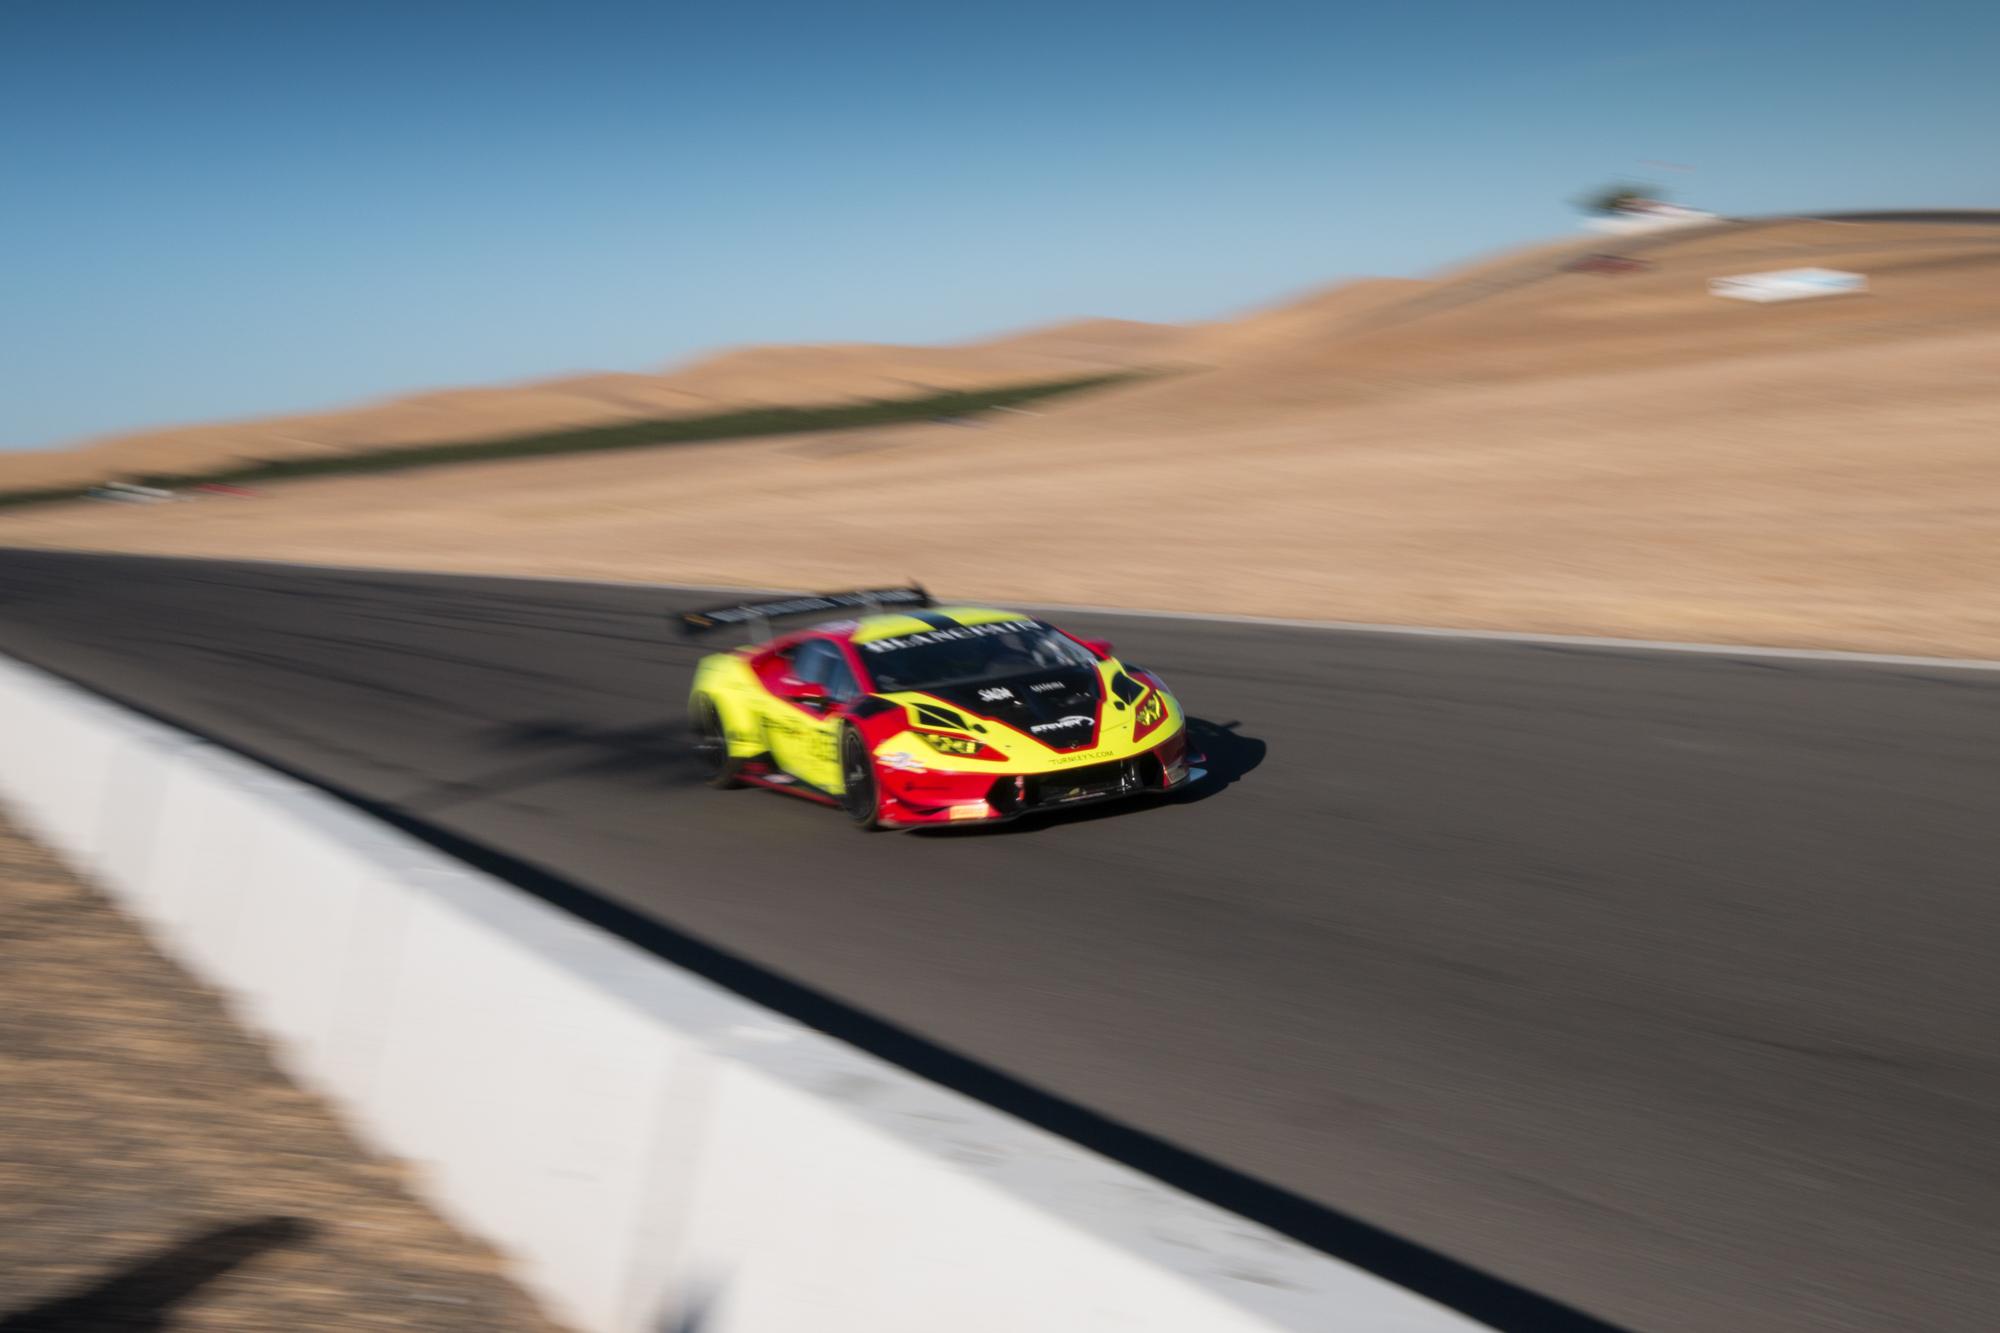 Steven-Racing-20130208-45763.jpg